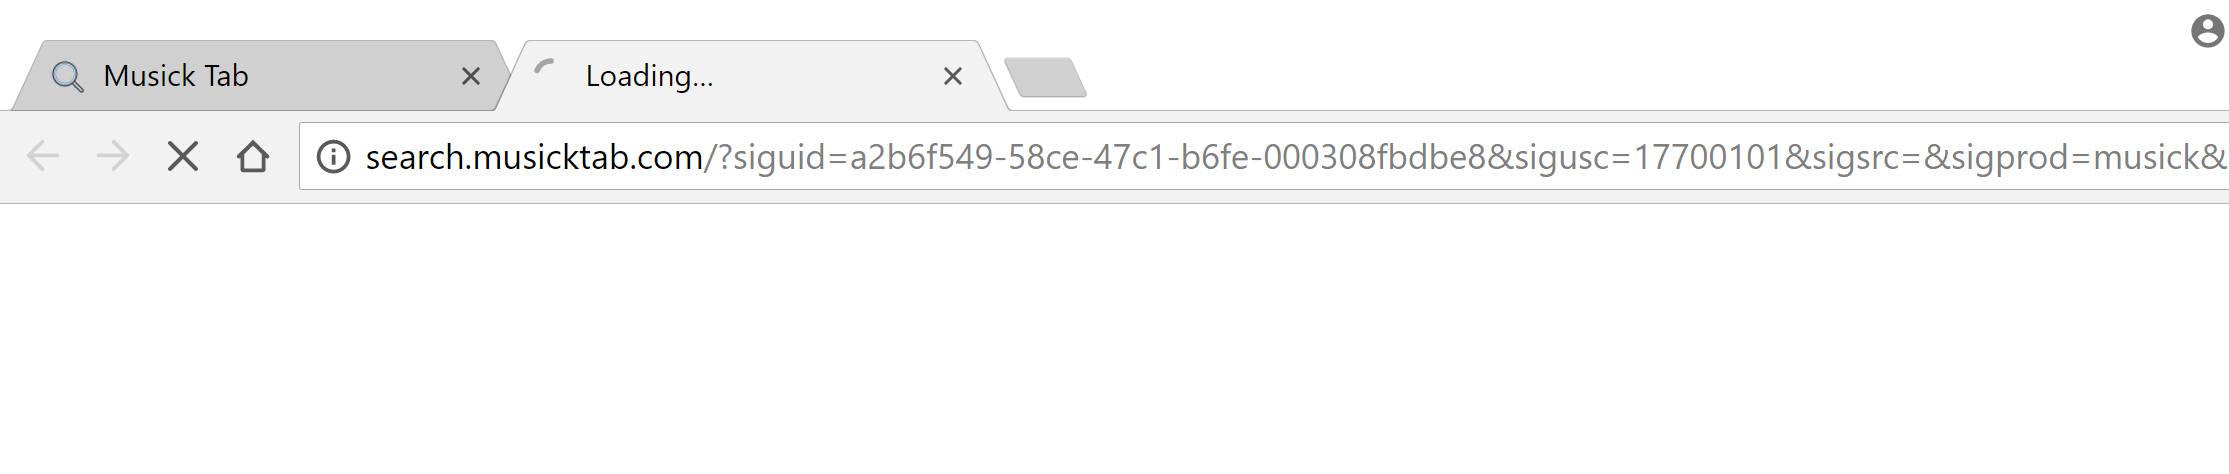 Search.musicktab.com Redirect Virus